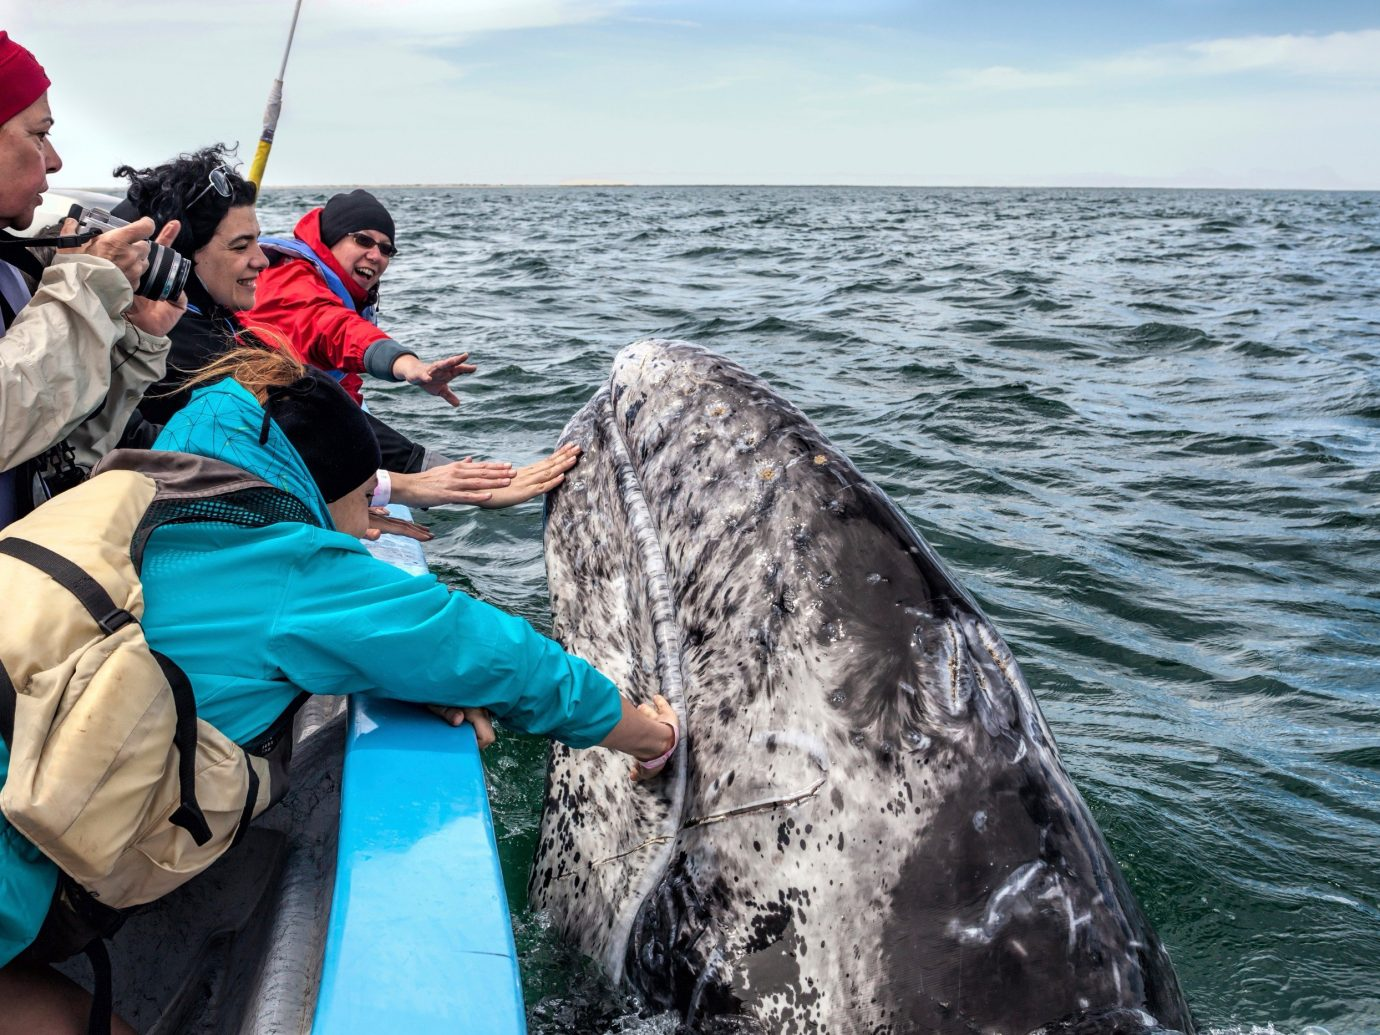 Trip Ideas water outdoor person sky Sea fishing marine mammal vehicle